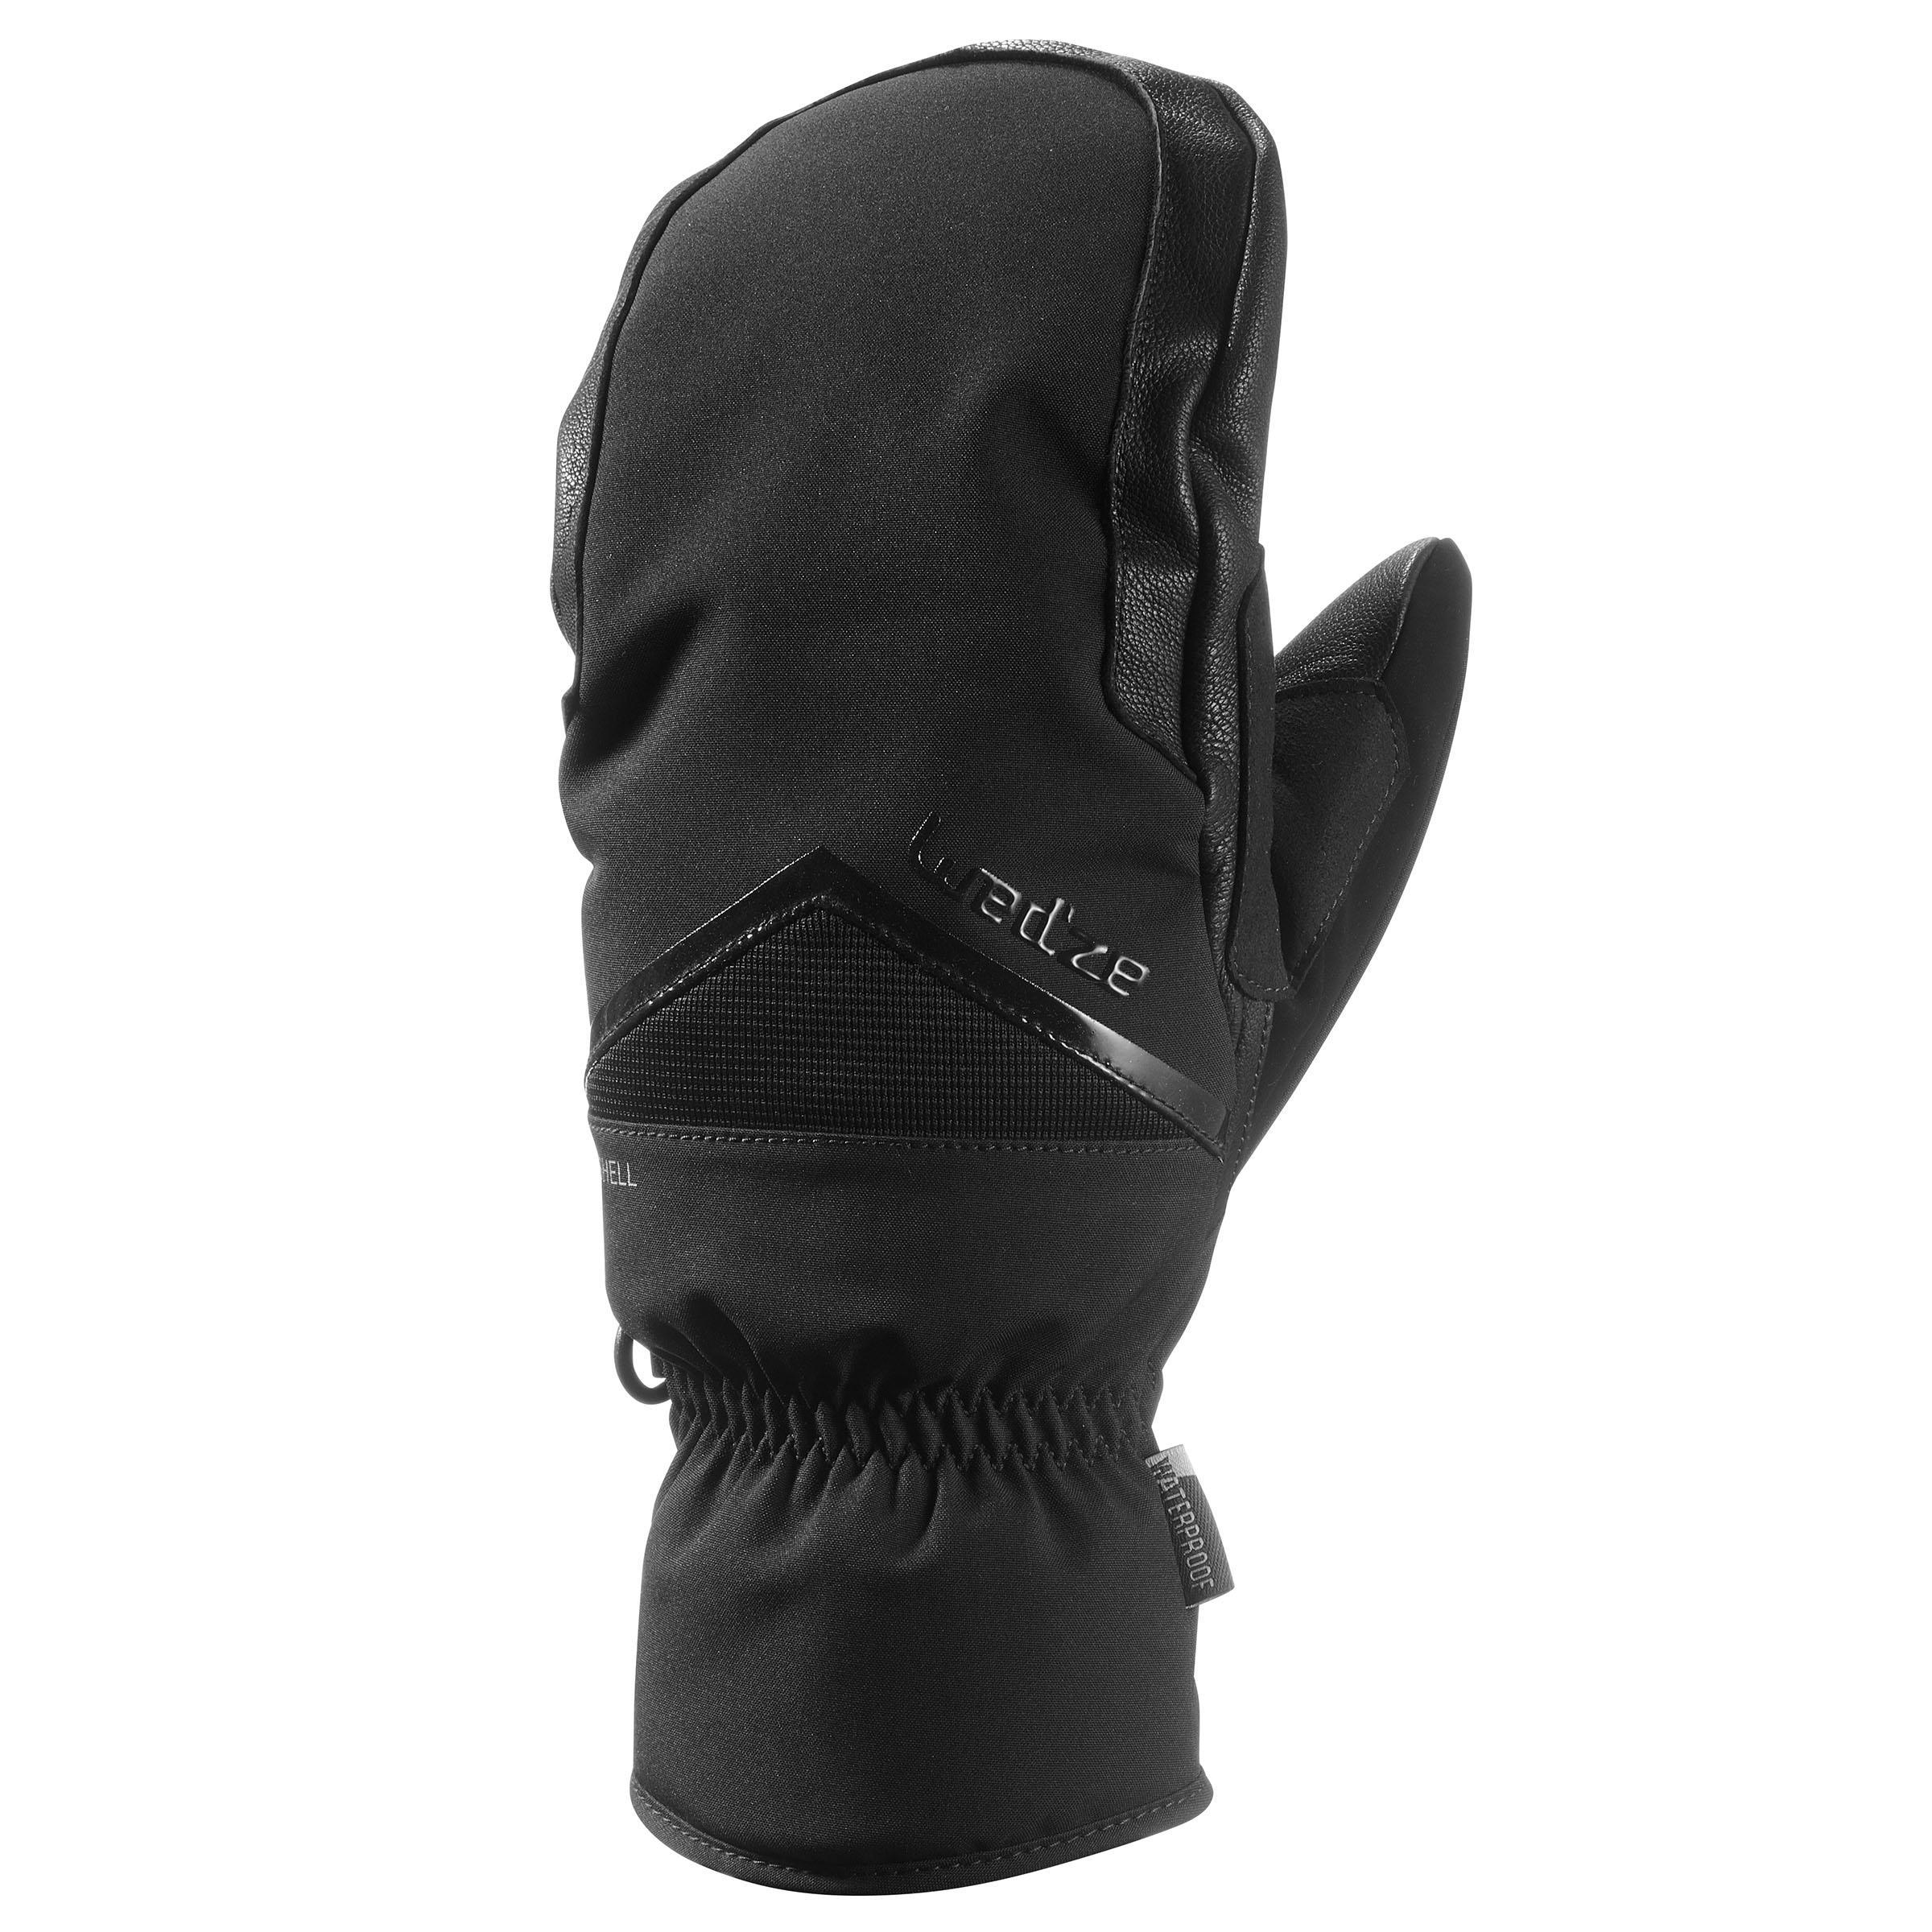 Fäustlinge Freeride MI 500 Erwachsene schwarz | Accessoires > Handschuhe | Wedze